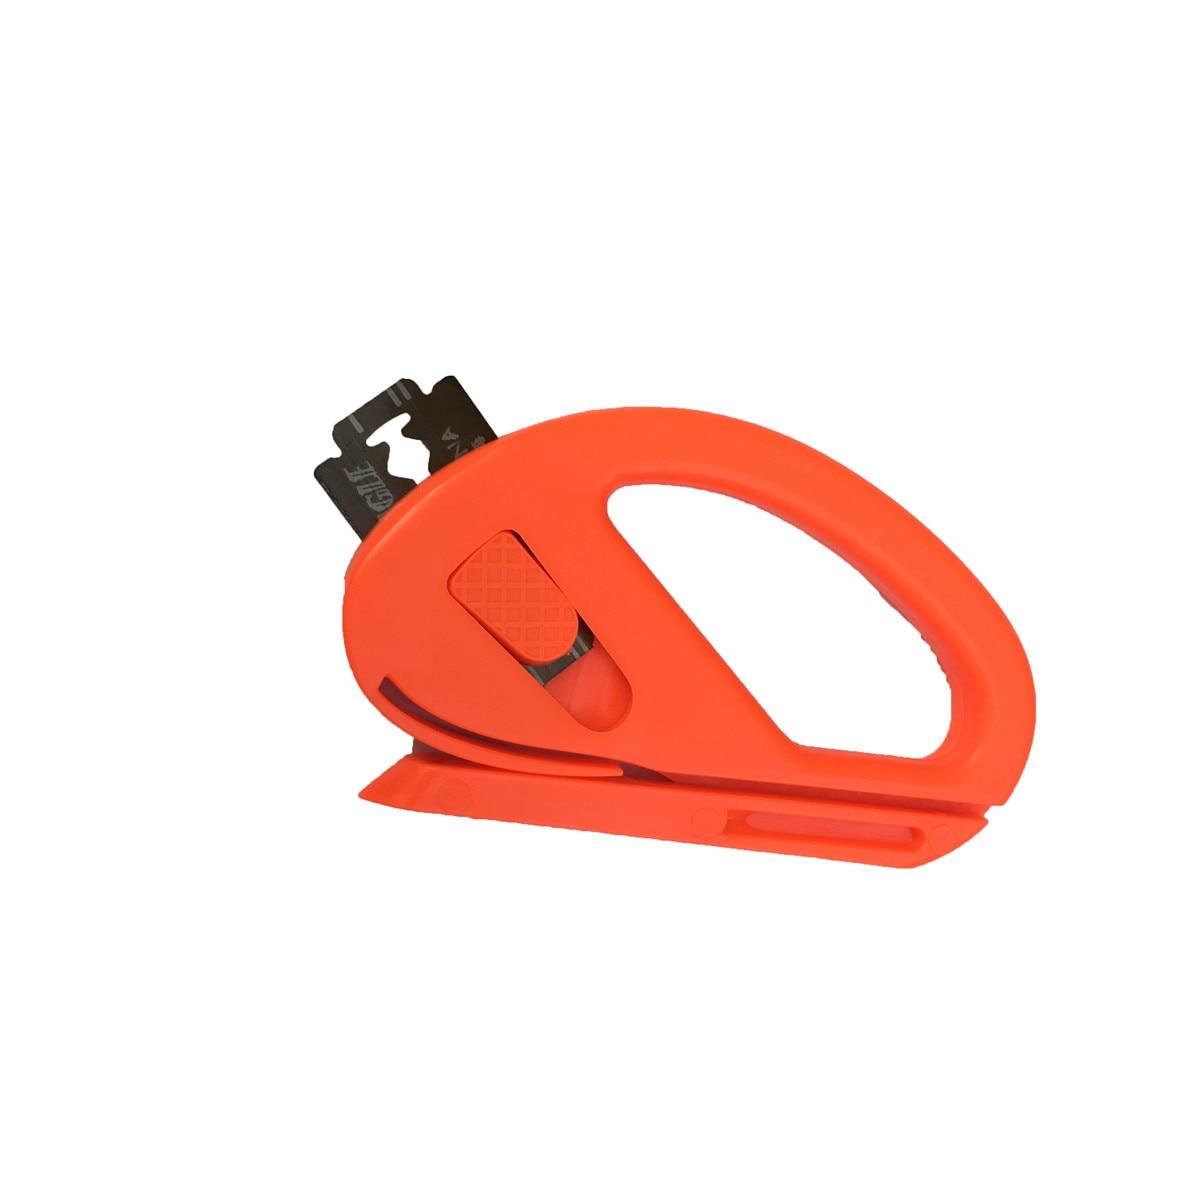 Ailproc オレンジオートビニールカッター車ステッカーカッティングナイフ炭素繊維フィルム 壁紙 パッケージマルチカッター車ラップアクセサリー 車のステッカー Aliexpress